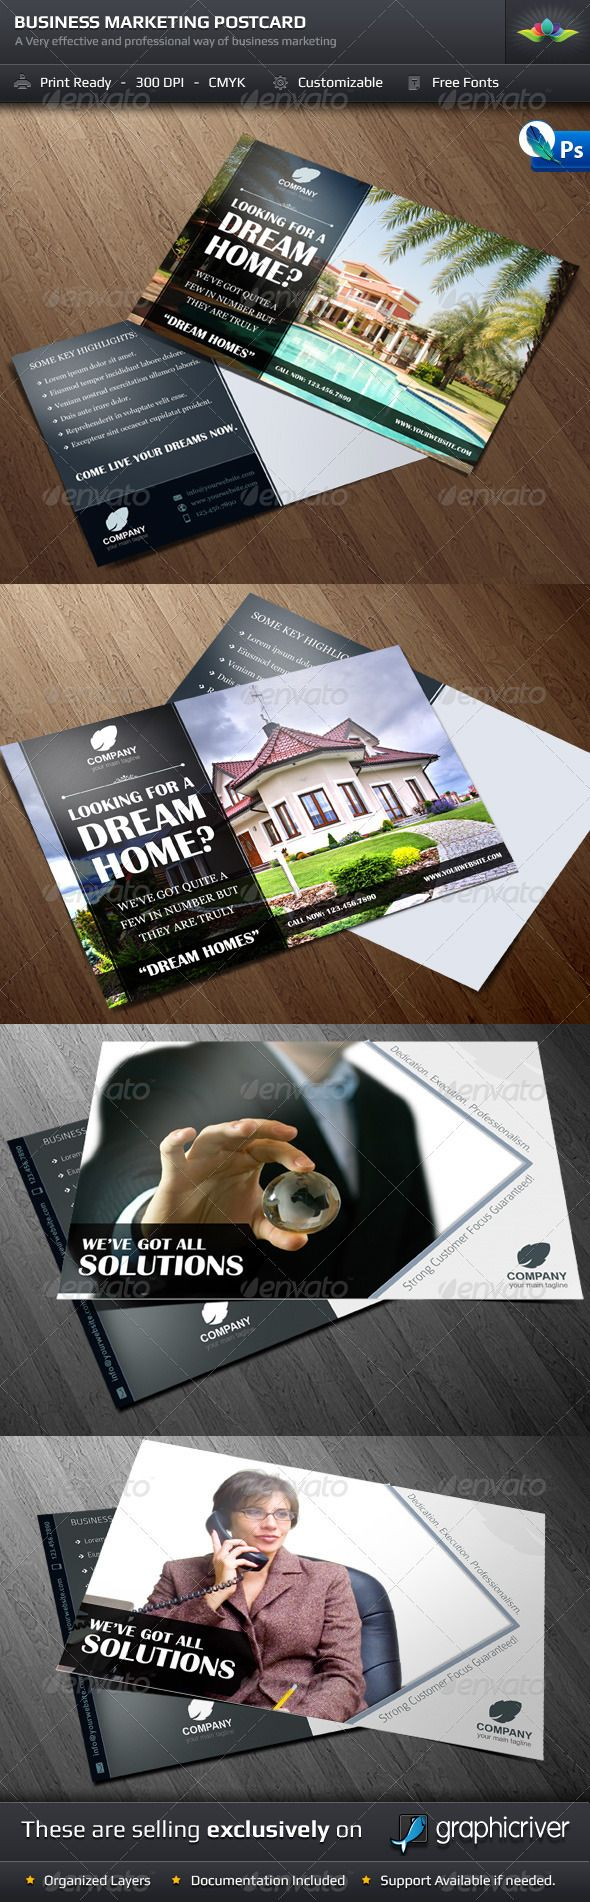 Postcard Design Ideas dance postcard design ideas Business Marketing Postcard Template Set